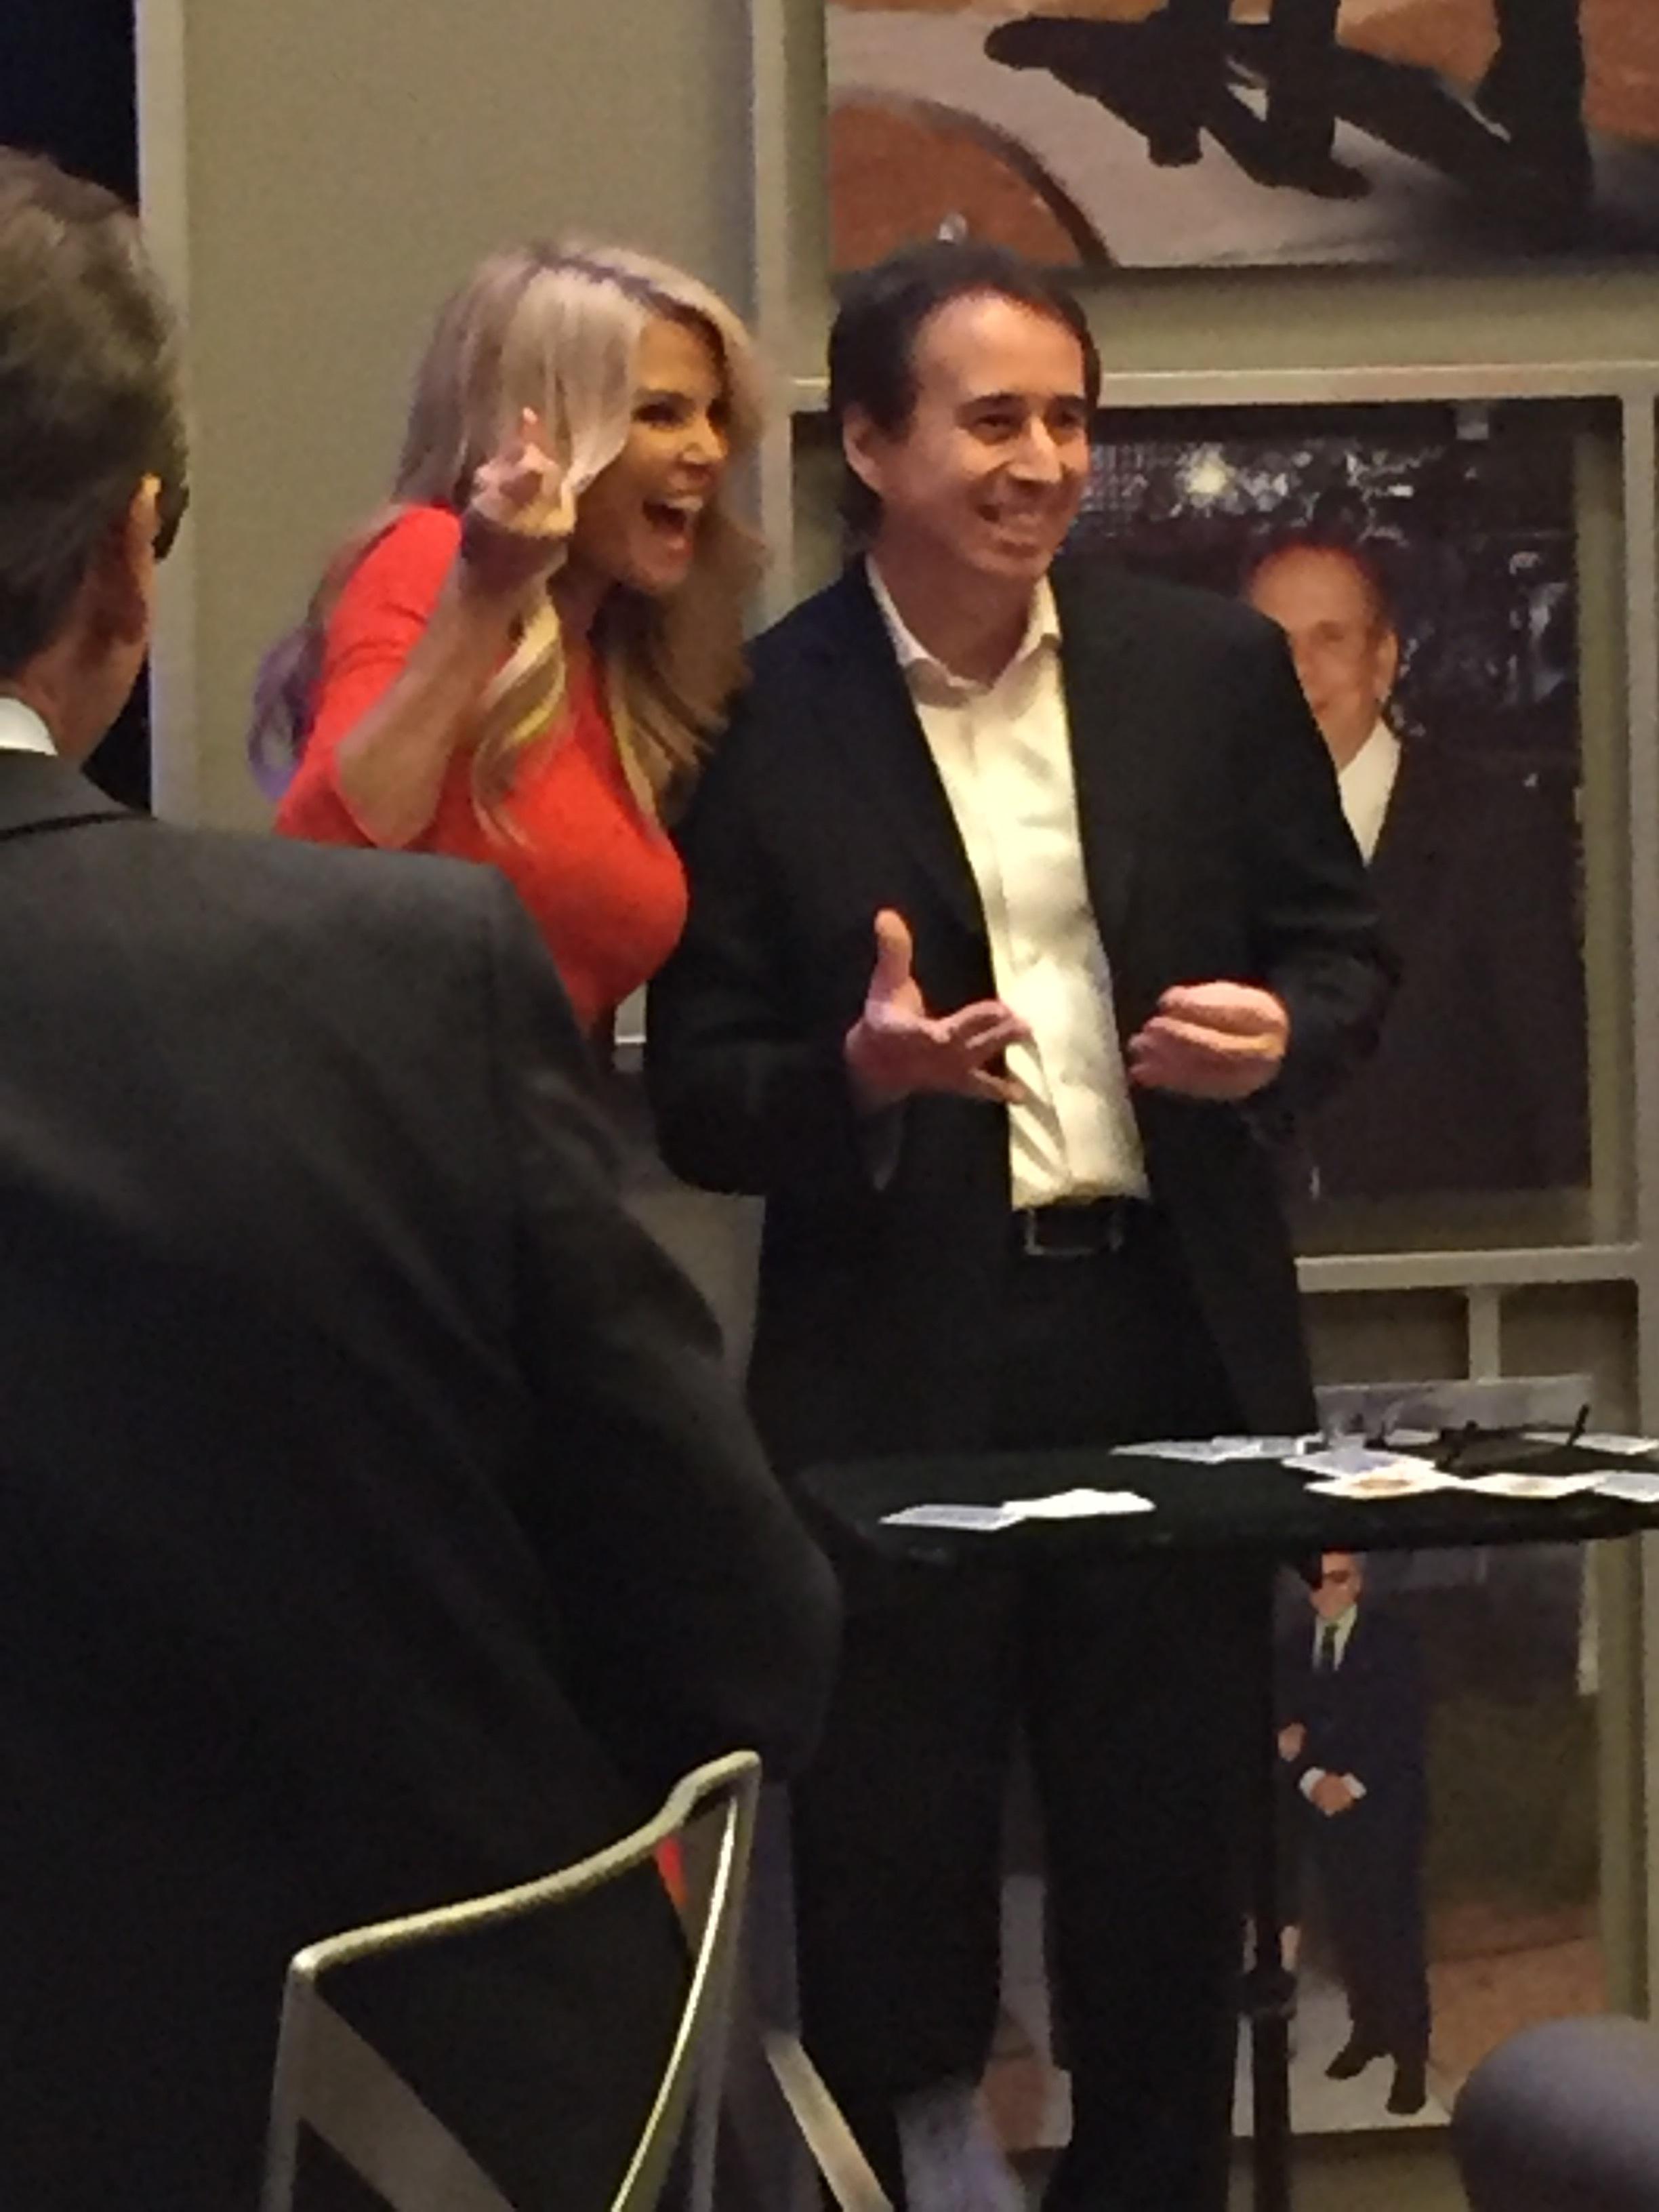 Christie Brinkley with magician Lou Serrano in Las Vegas 2016.